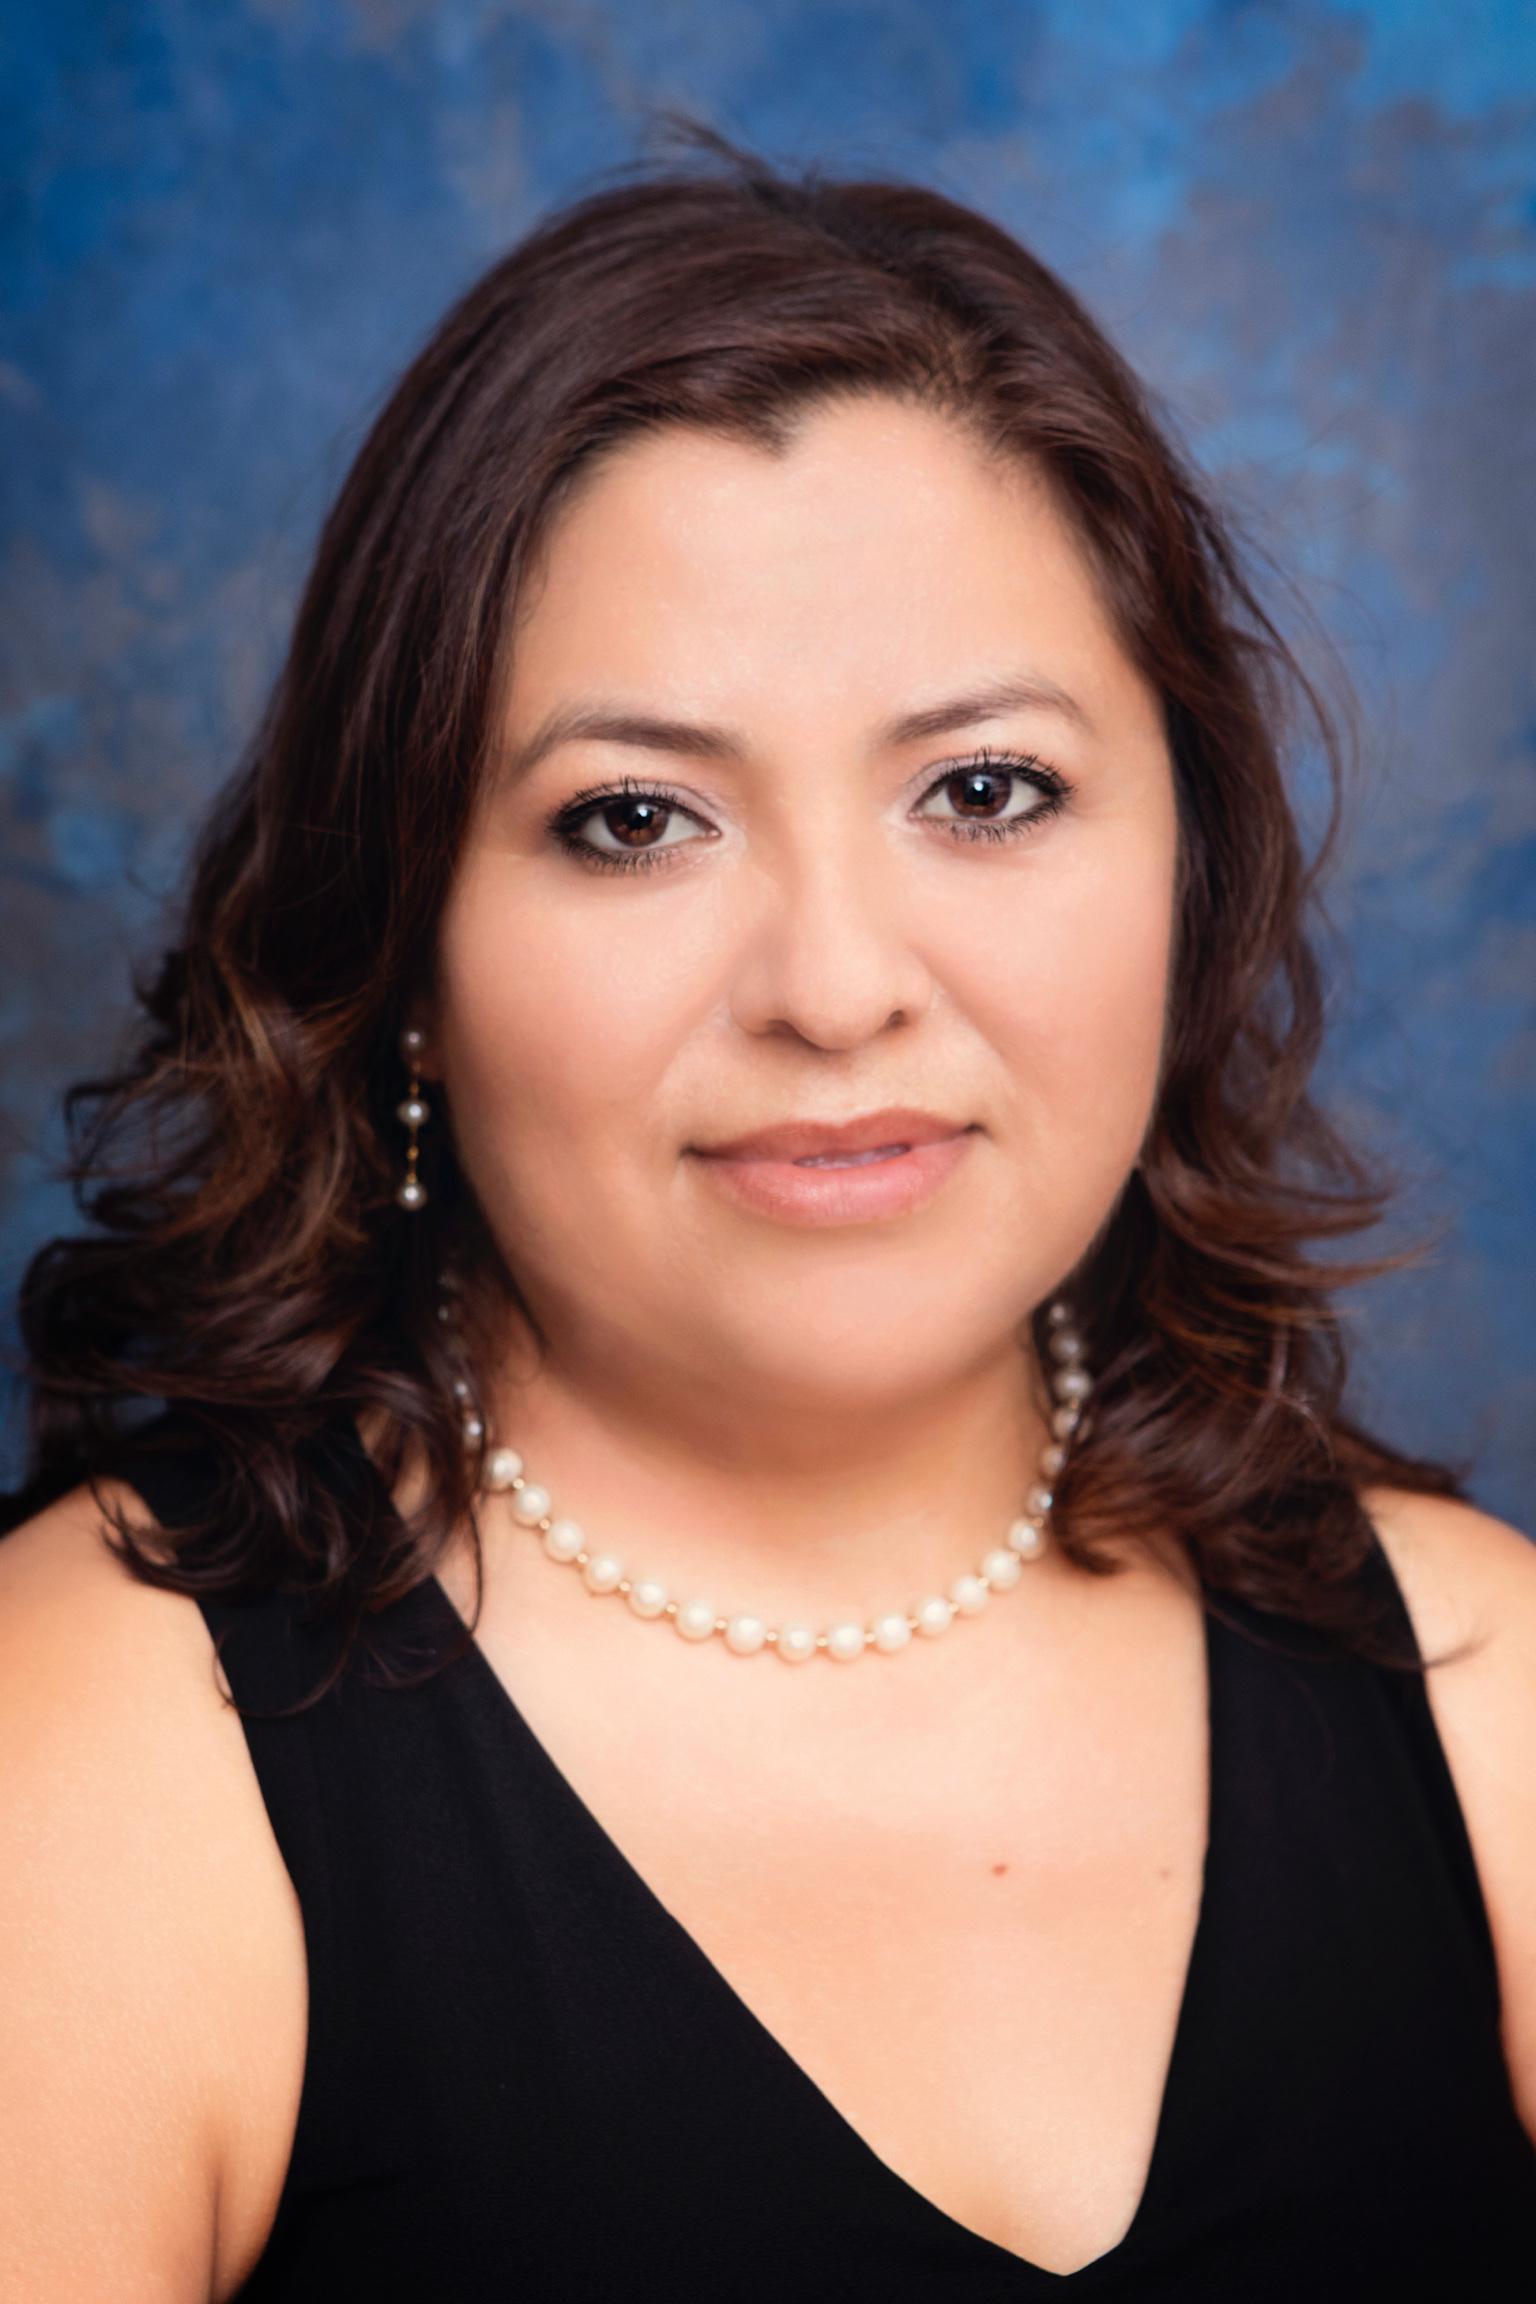 Liliana undefined Hernandez